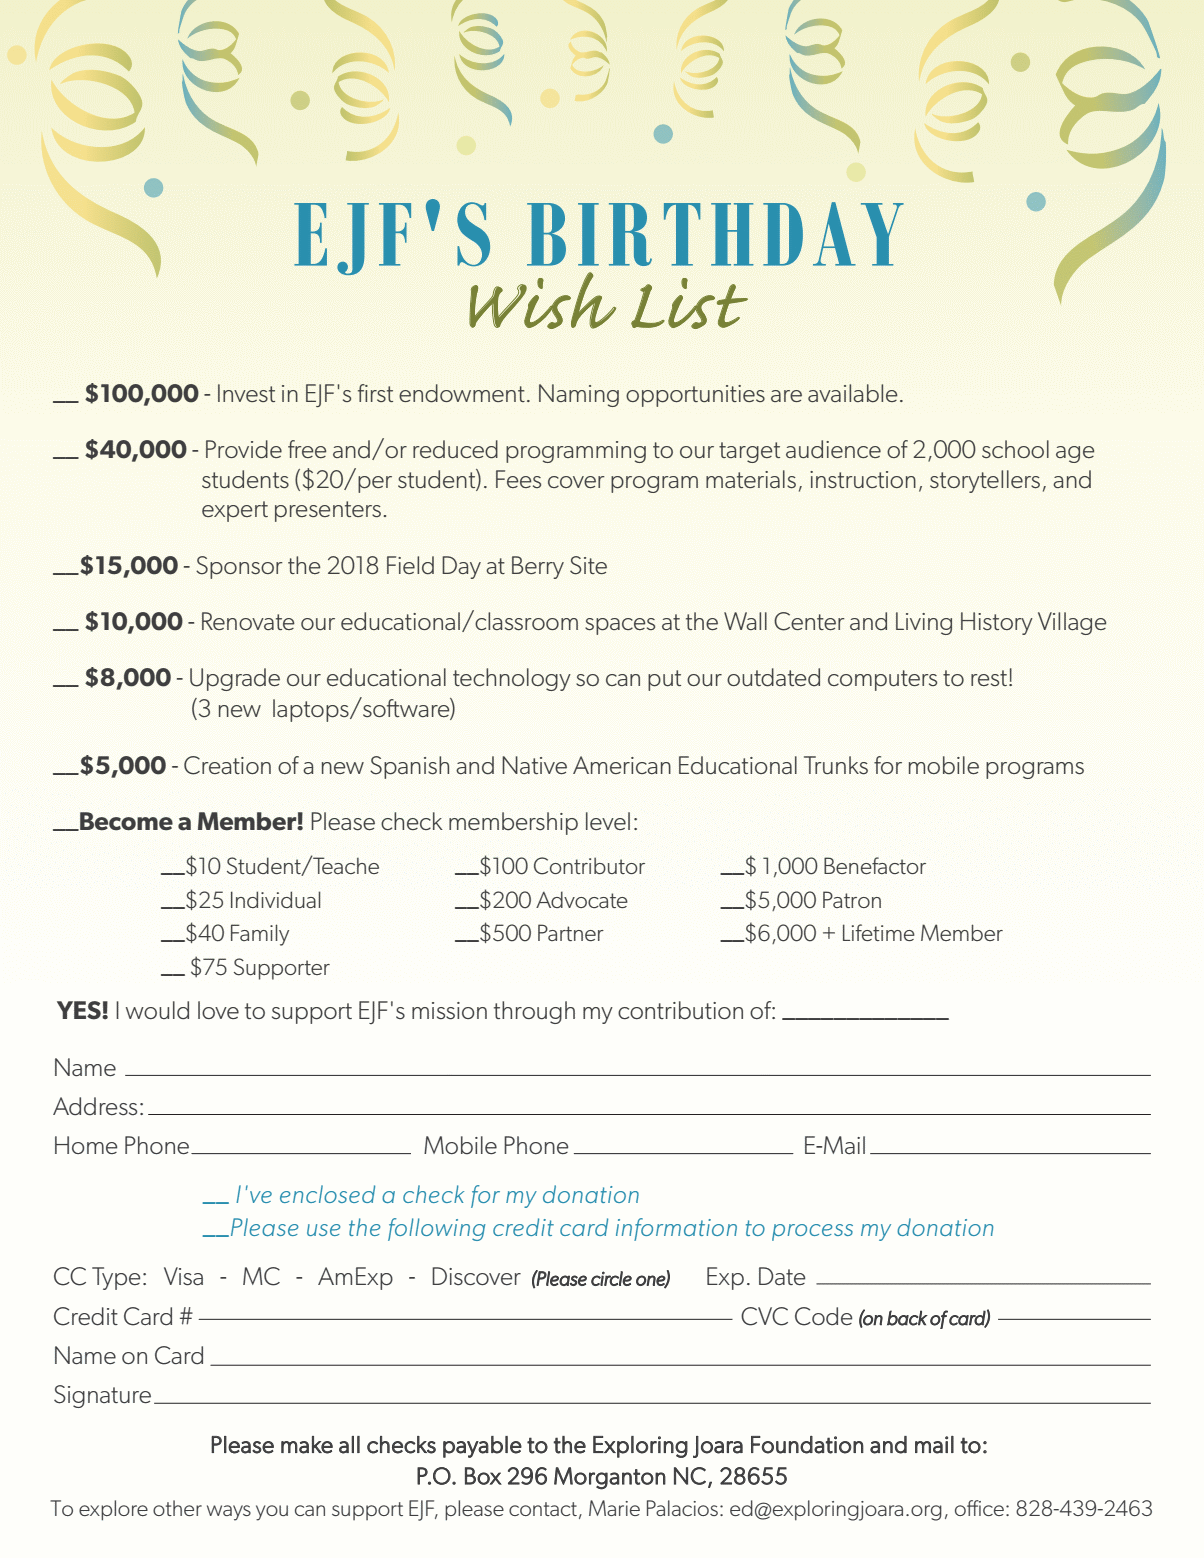 Birthday Wish List for Exploring Joara Foundation